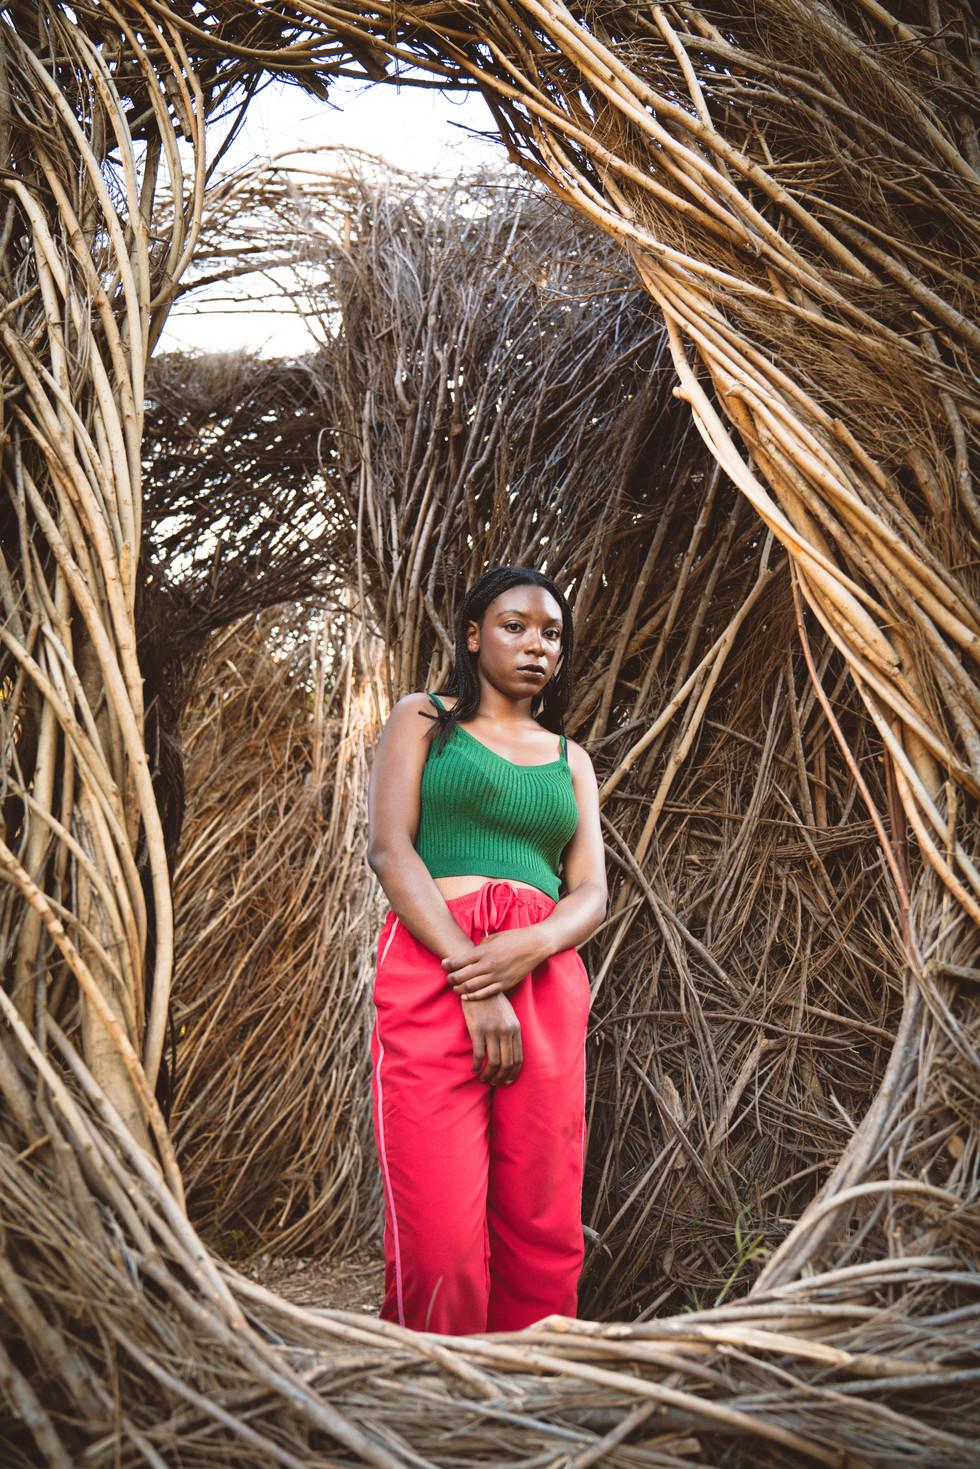 Woman Standing in Tree Sculpture | Portrait/Fashion Photography | Chromatone Studios